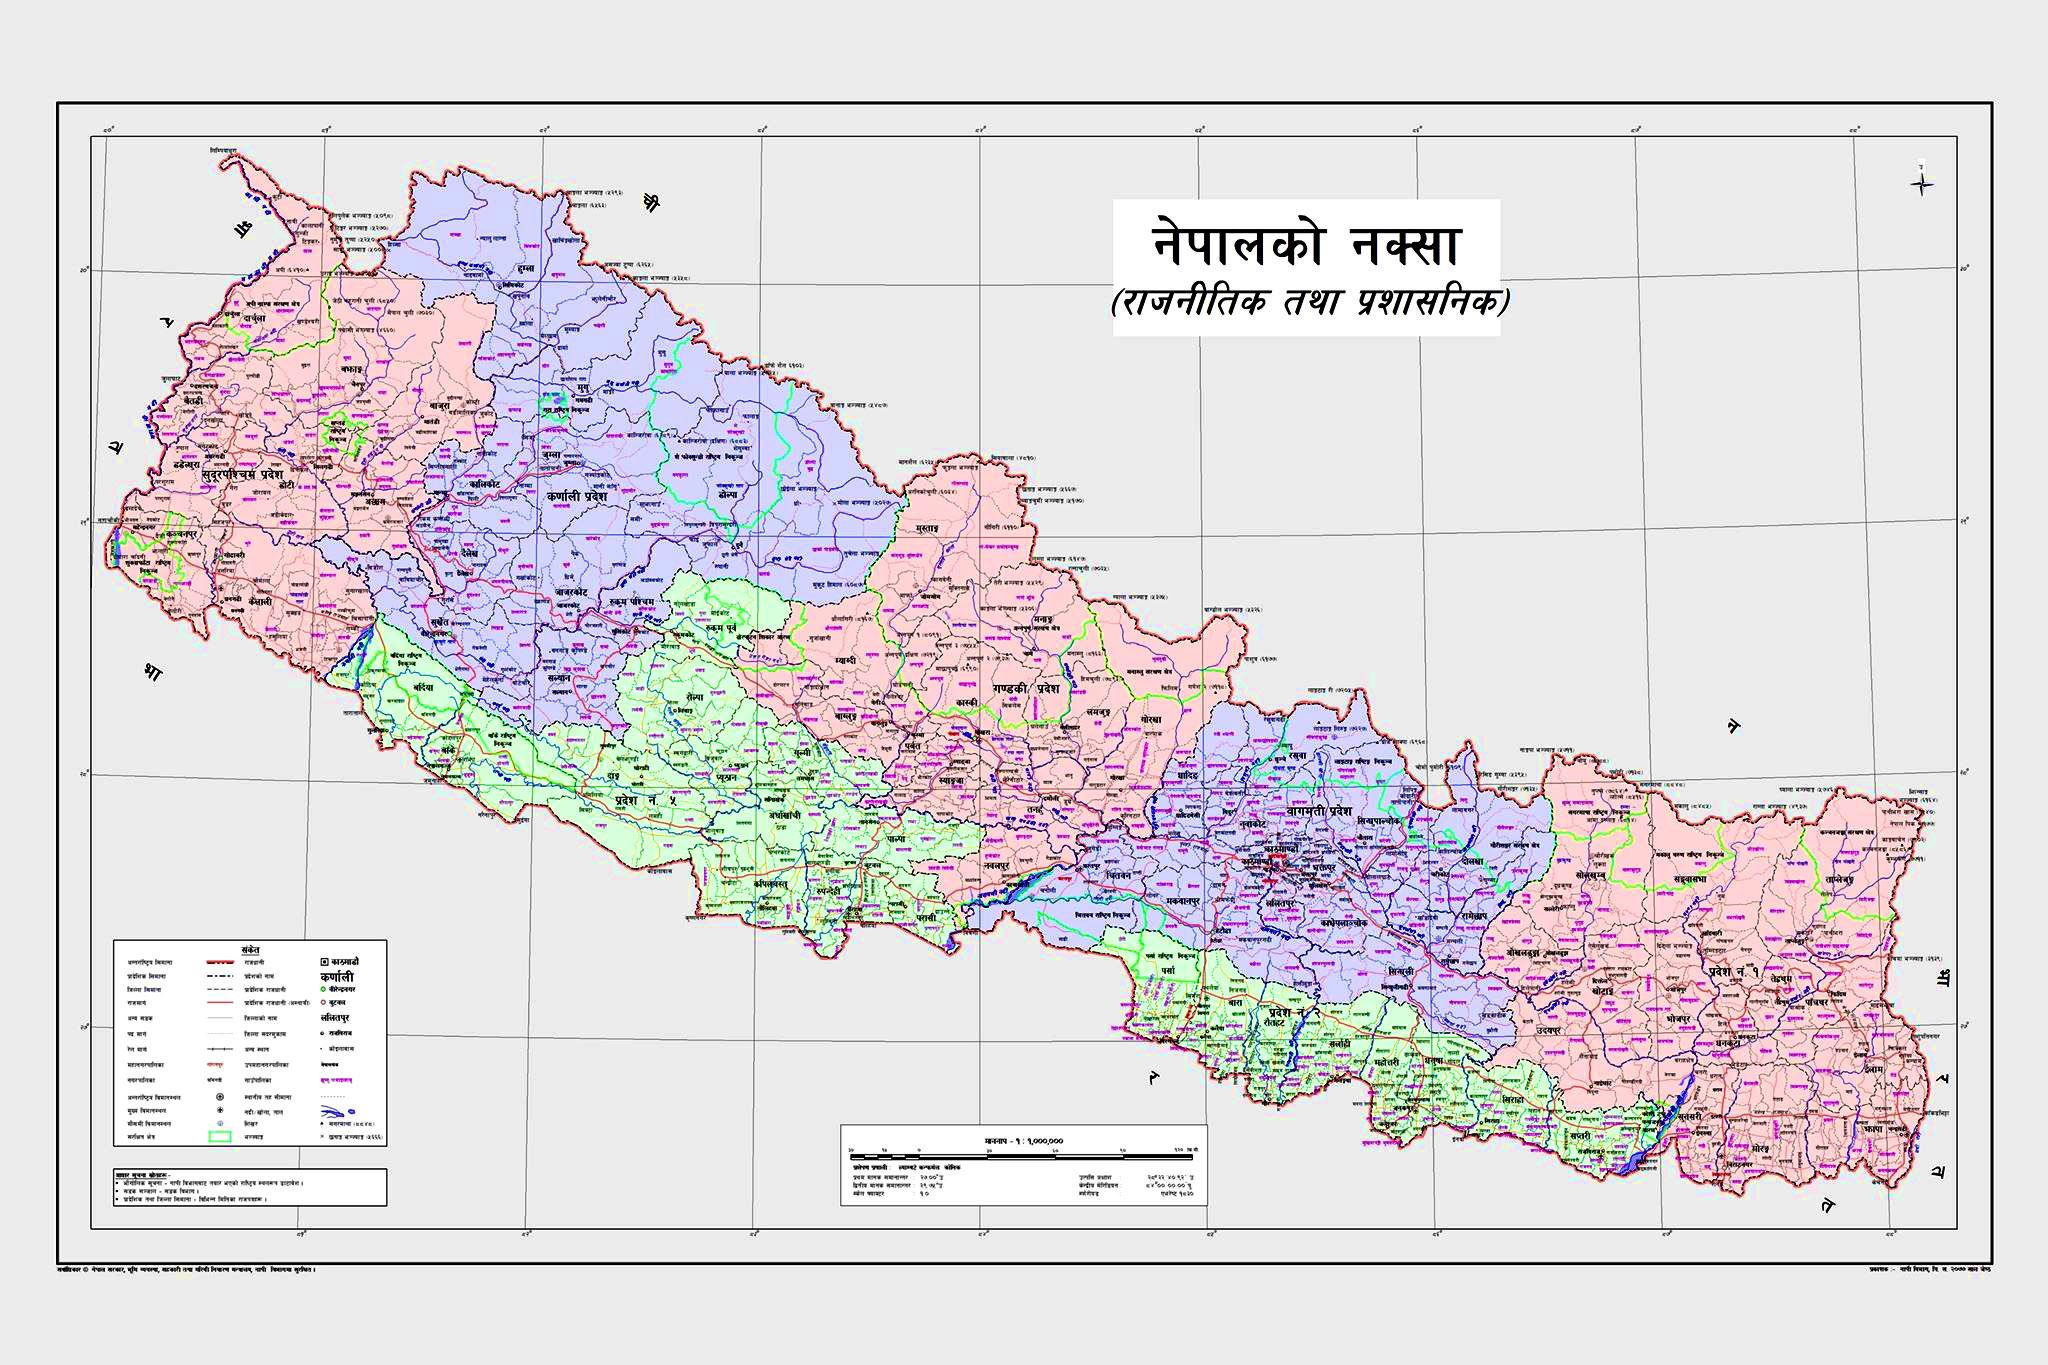 The new political map of Nepal comprising the disputed lands of Kalapani, Limpuyadhura, Lipulekh, published on May 20, 2020. Photo Courtesy: Bishnu Rimal/Twitter